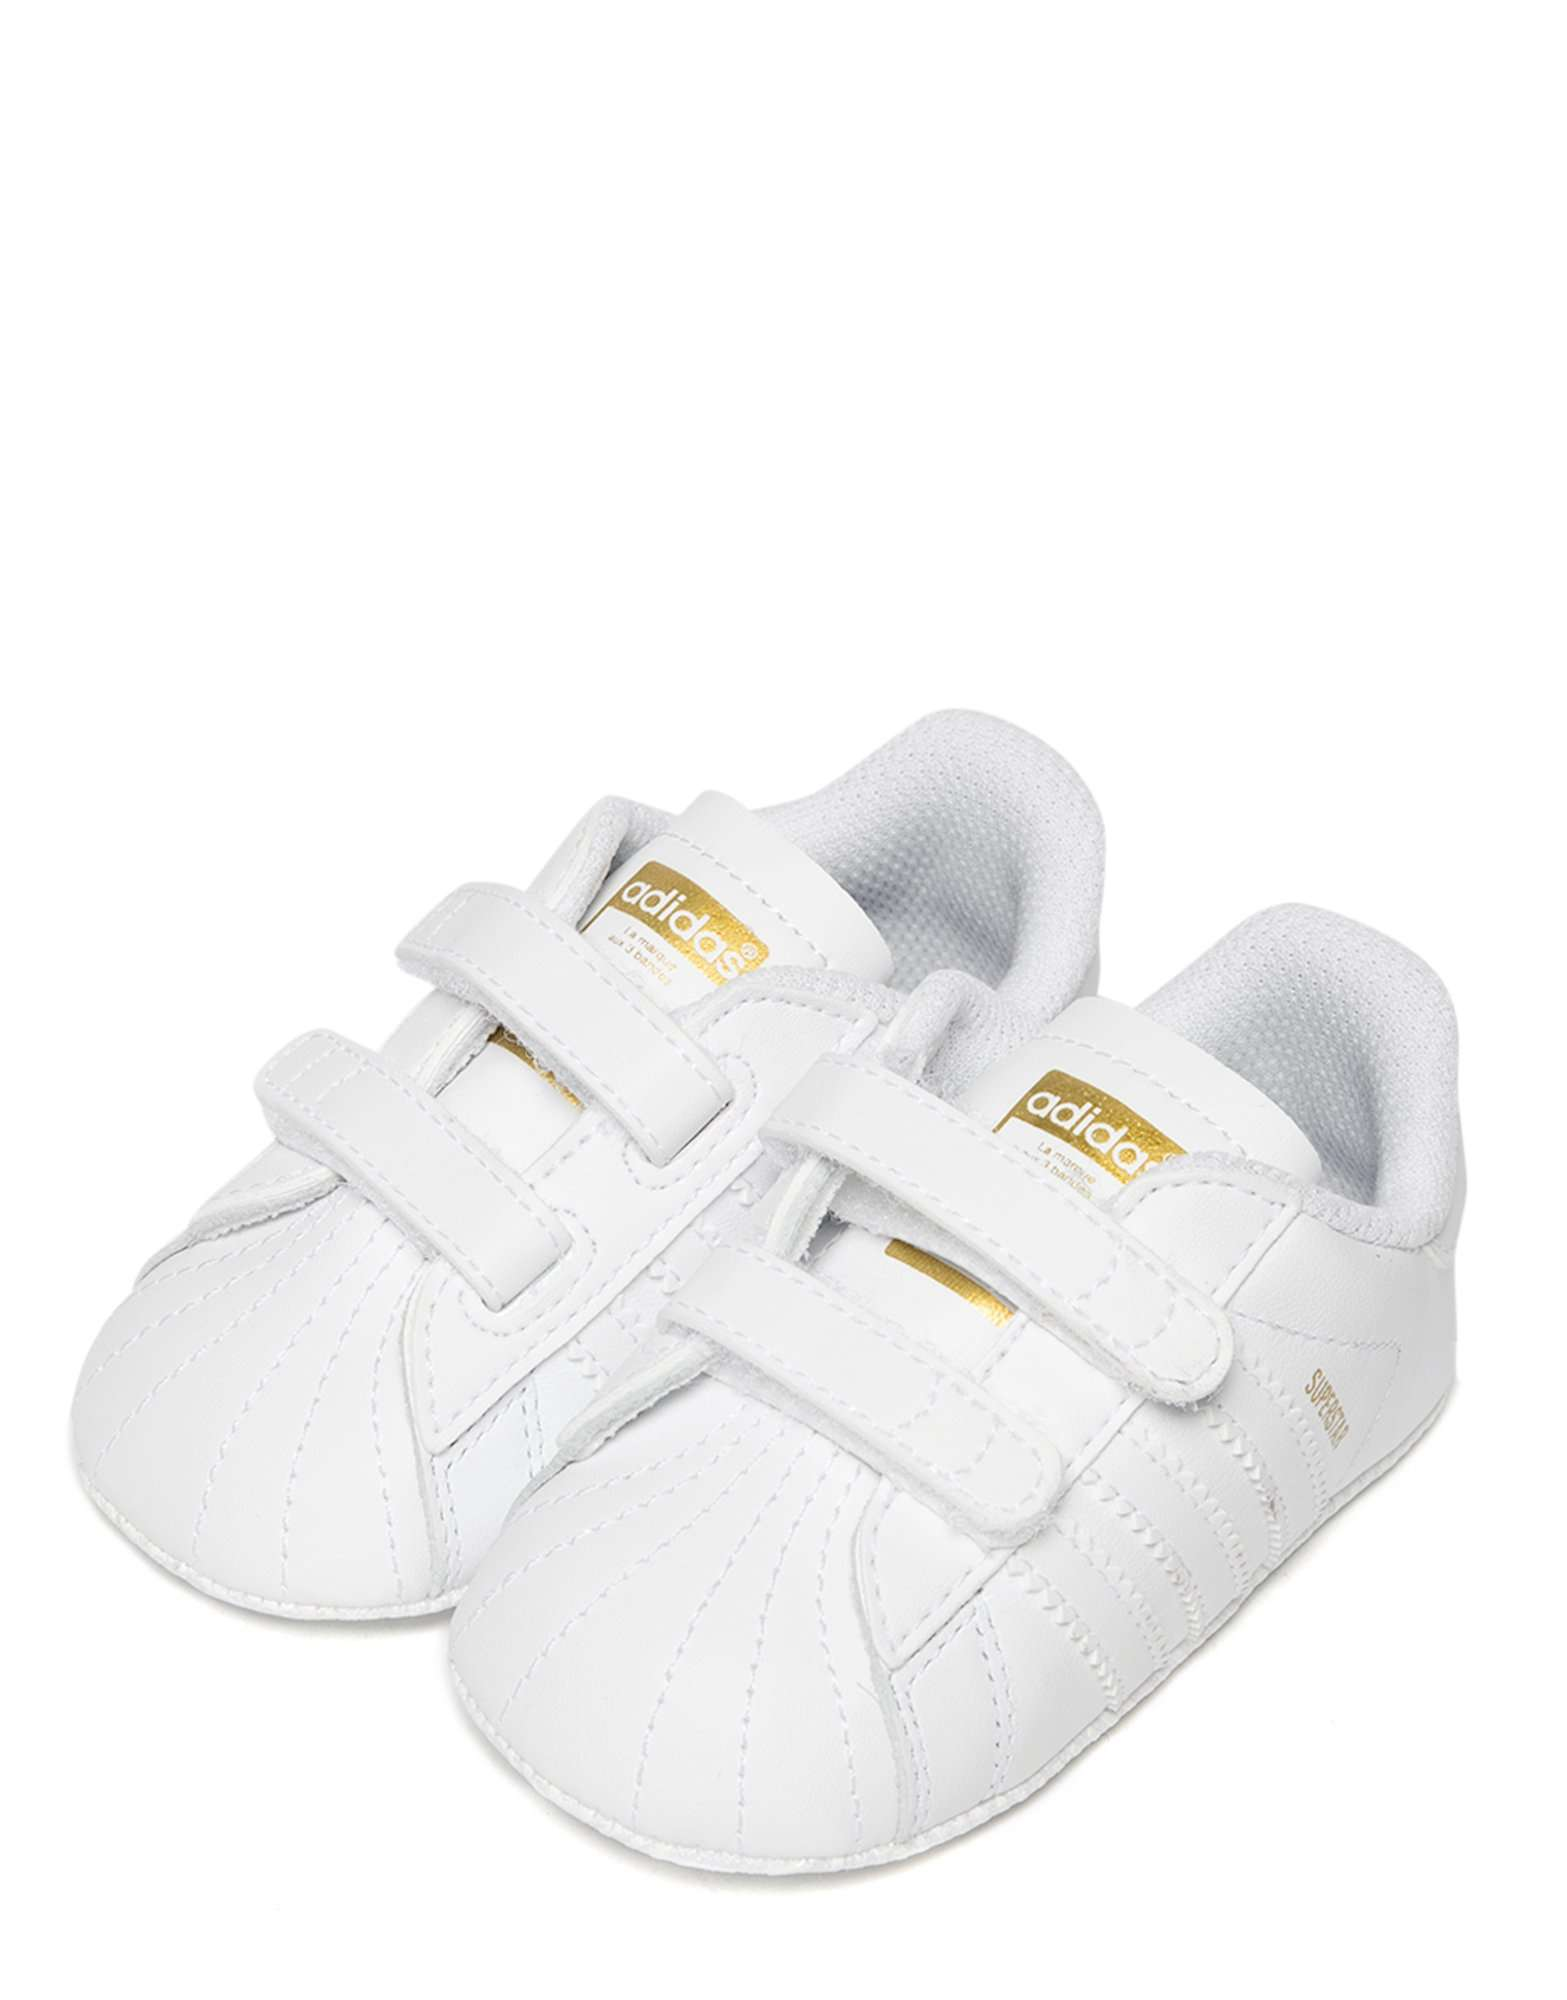 bc29ed243a3 Adidas Schoenen Babys brabantbreedband.nl